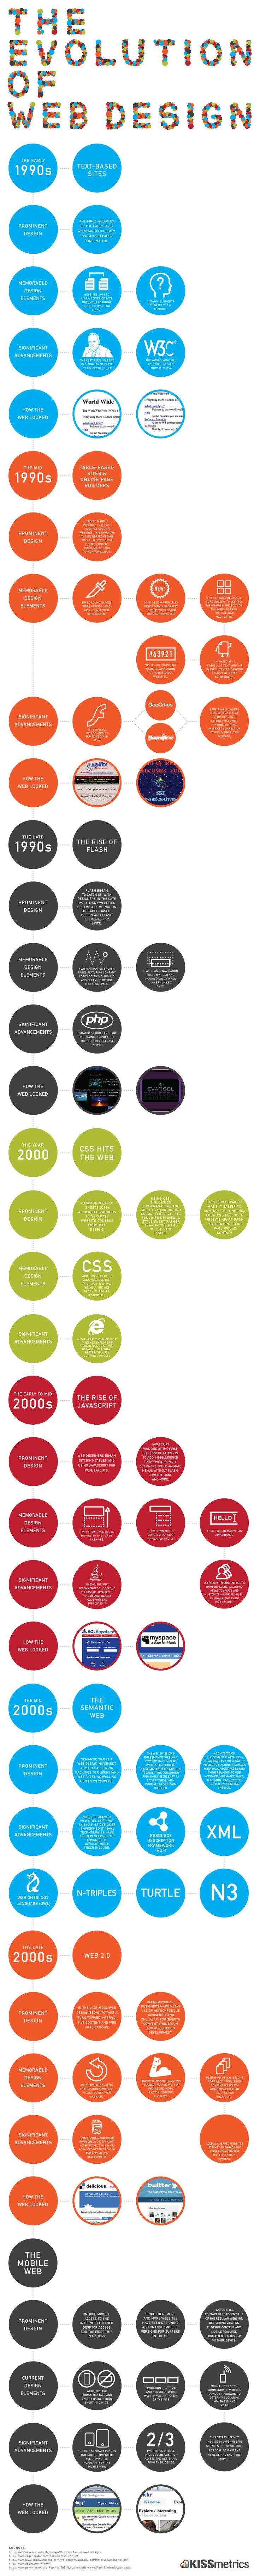 The Evolution of Web Design - high quality: Webdesign, Design Infographic, Web Design, Website, Web Site, Development Of, Design Evolution, Design